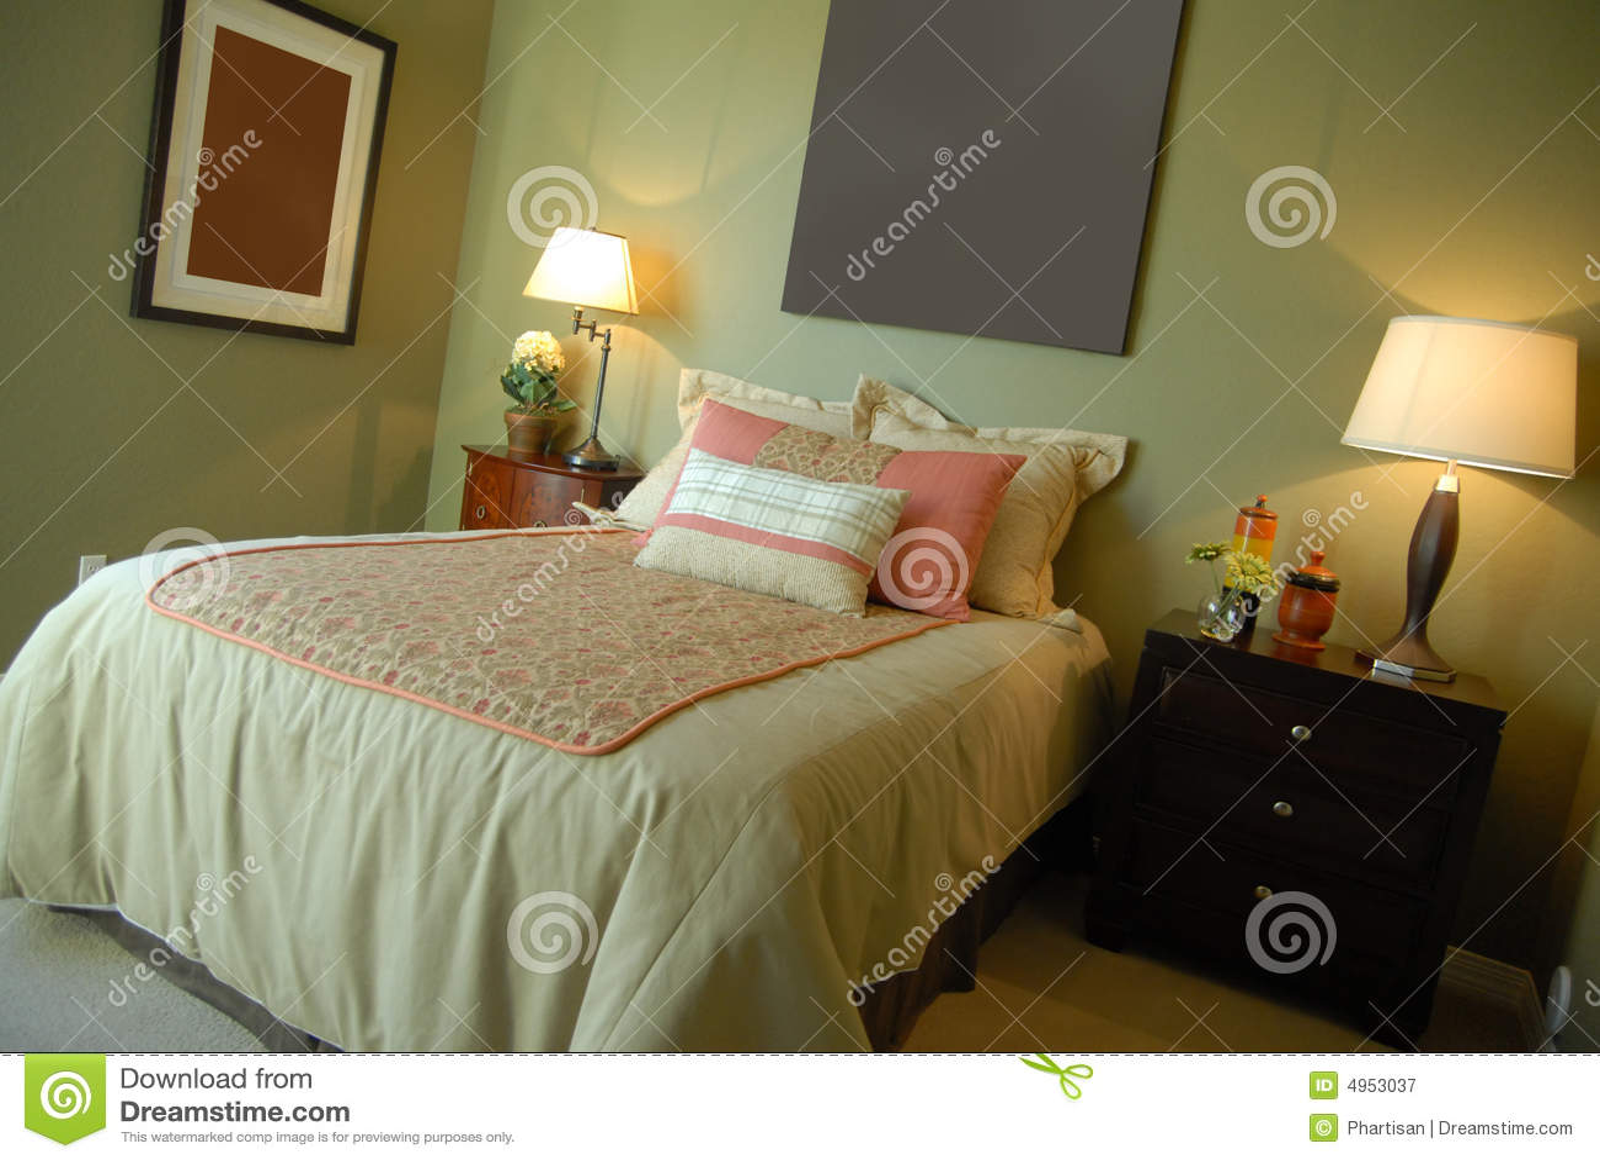 Beautiful bedroom interior design royalty free stock photo for Beautiful bedroom interior